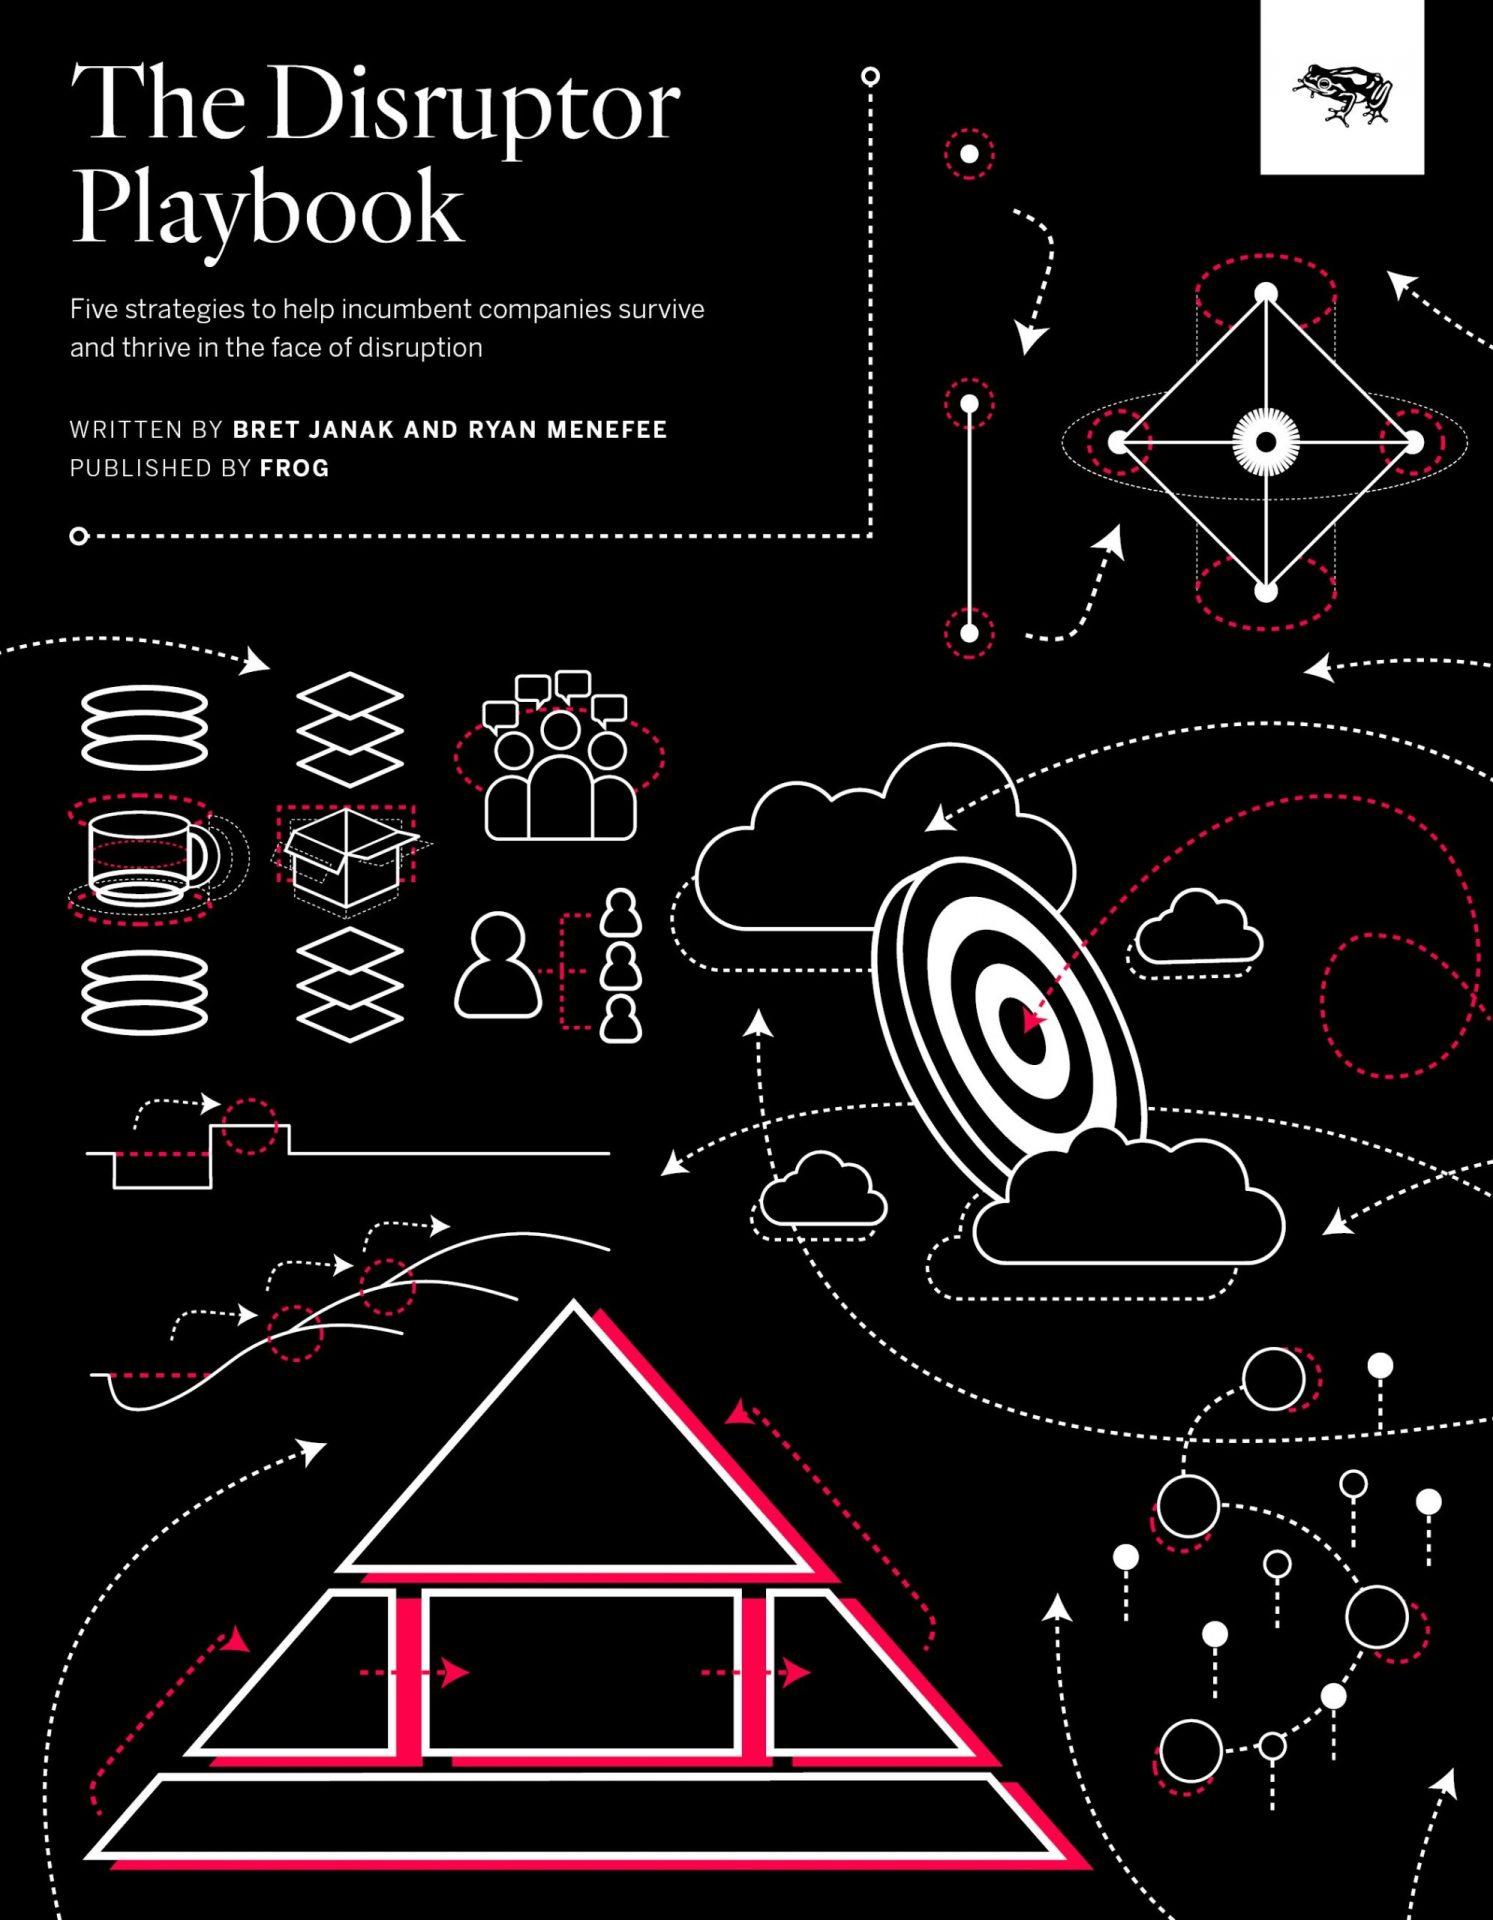 120_Disruptor-Playbook-POV-BOOK_2020_final_v5